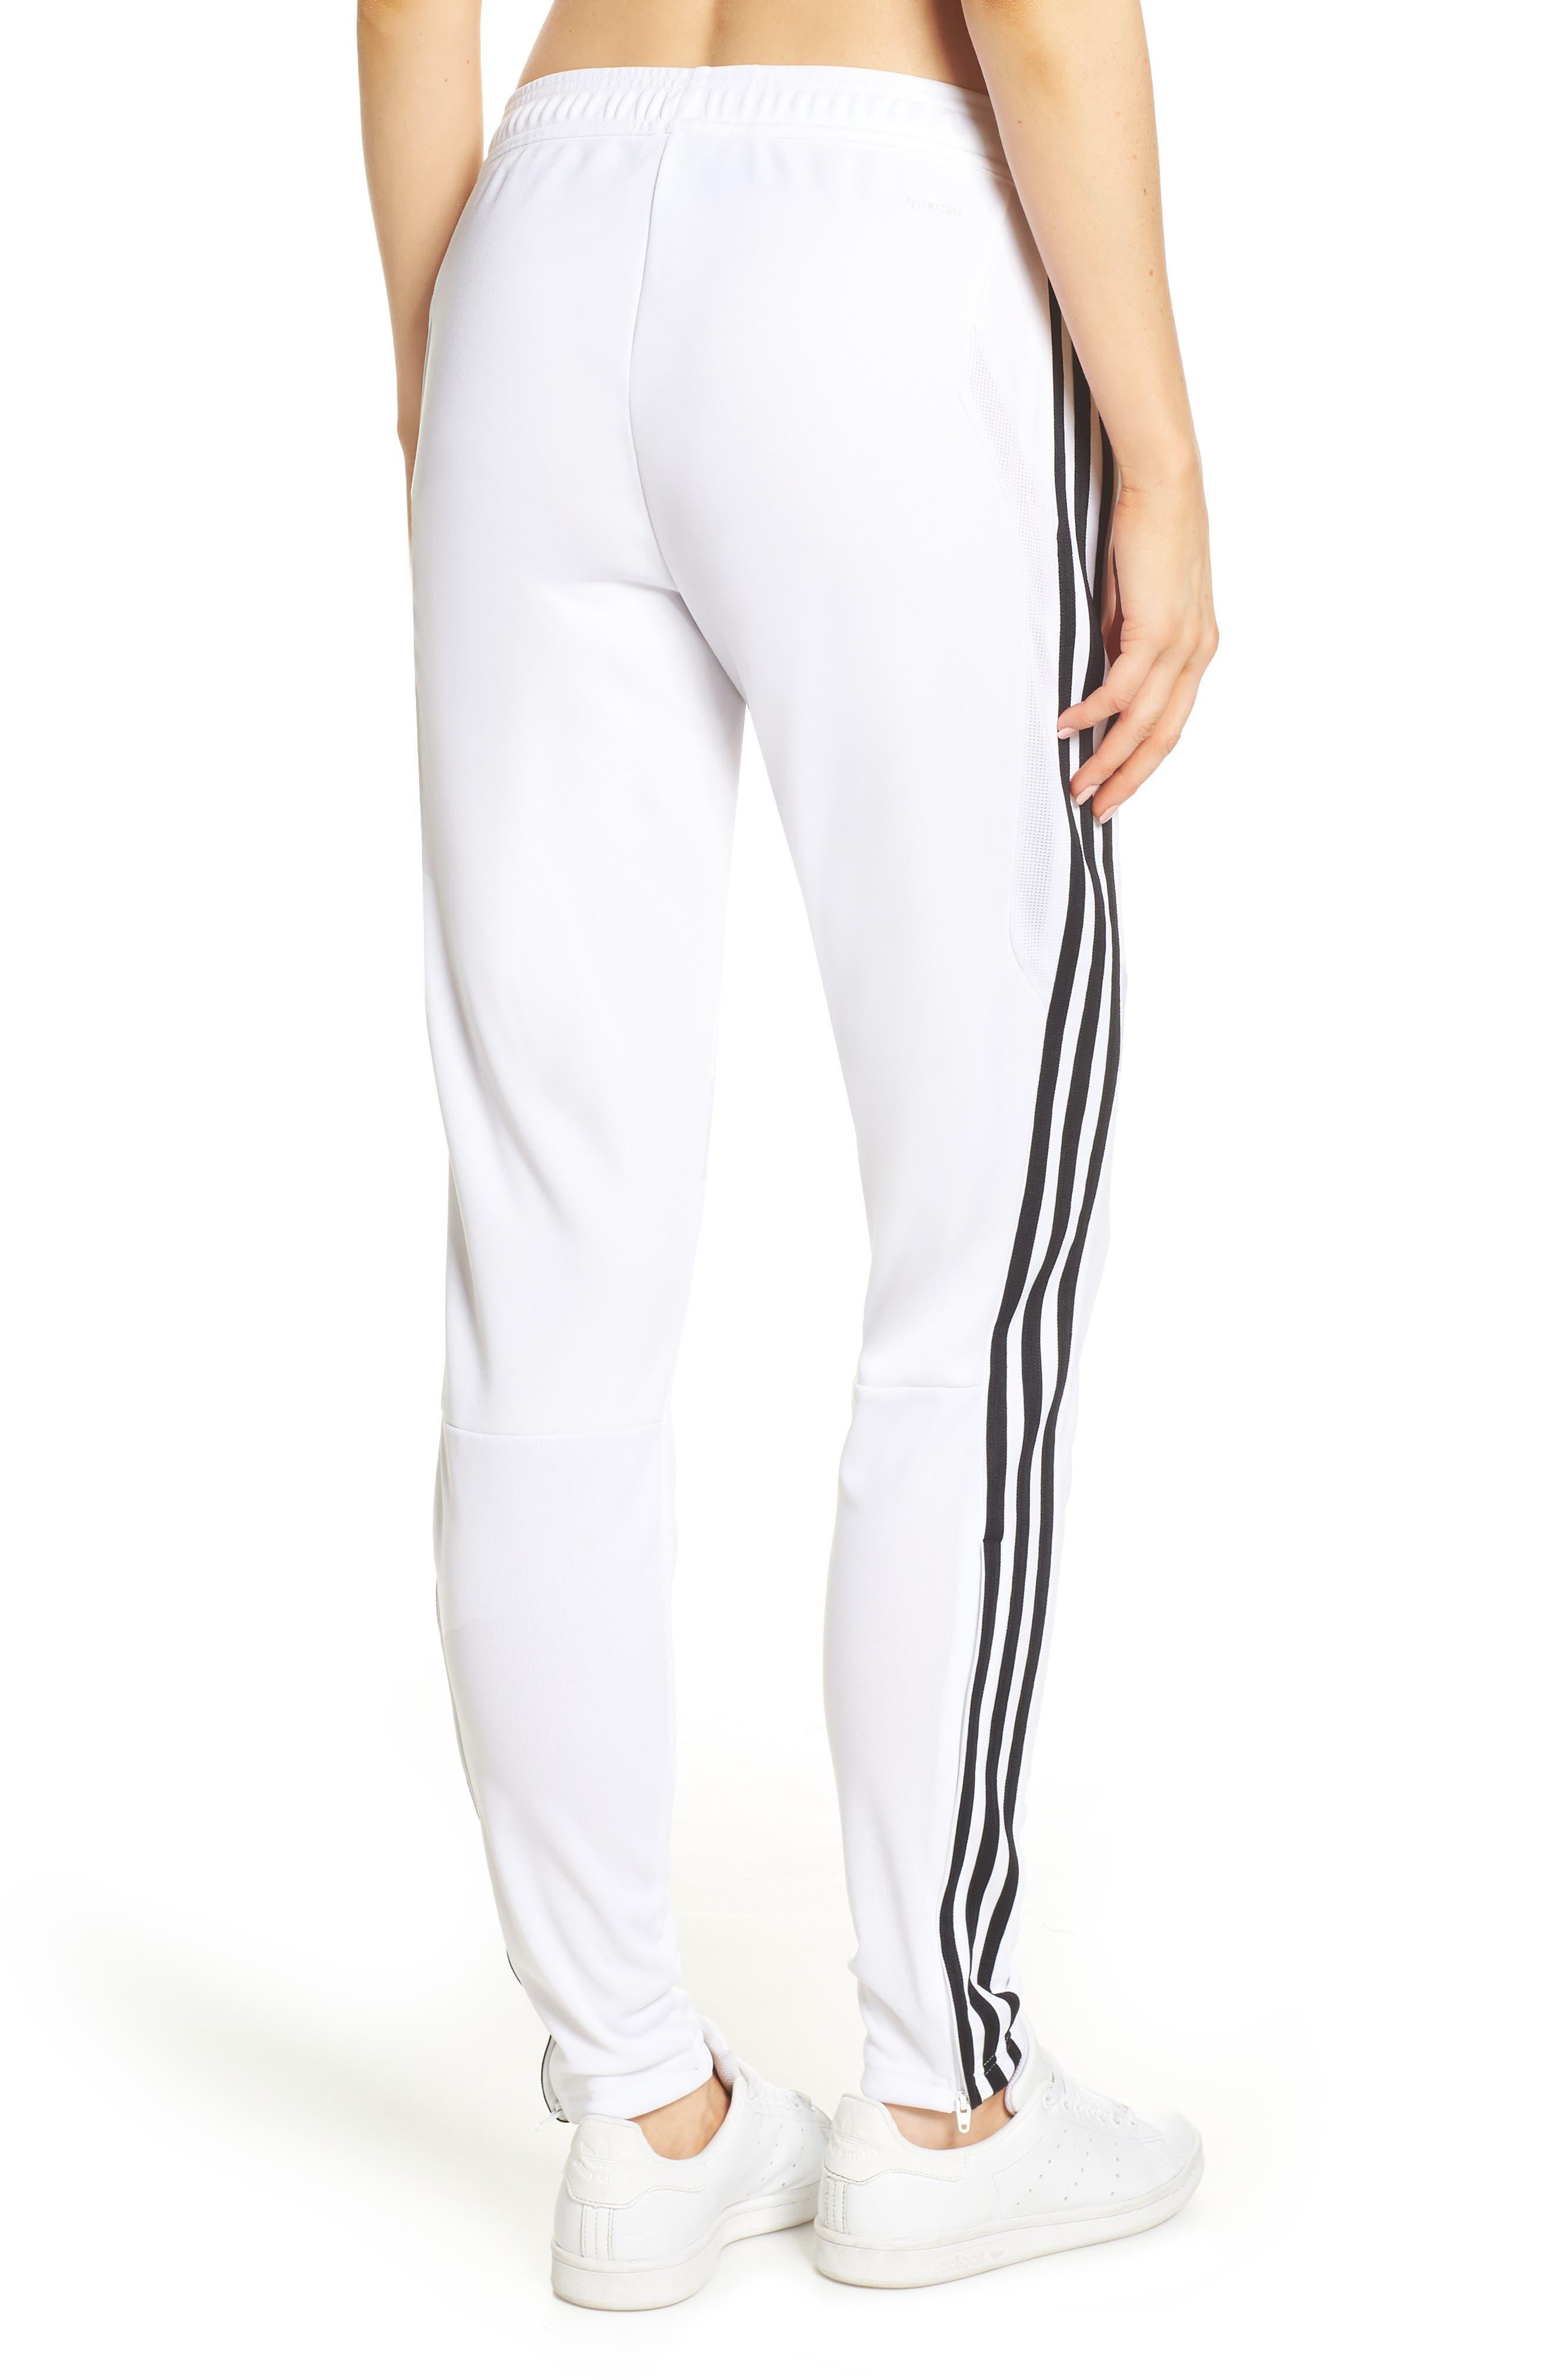 ADIDAS, Tiro 19 Training Pants, Alternate thumbnail 2, color, WHITE/ BLACK